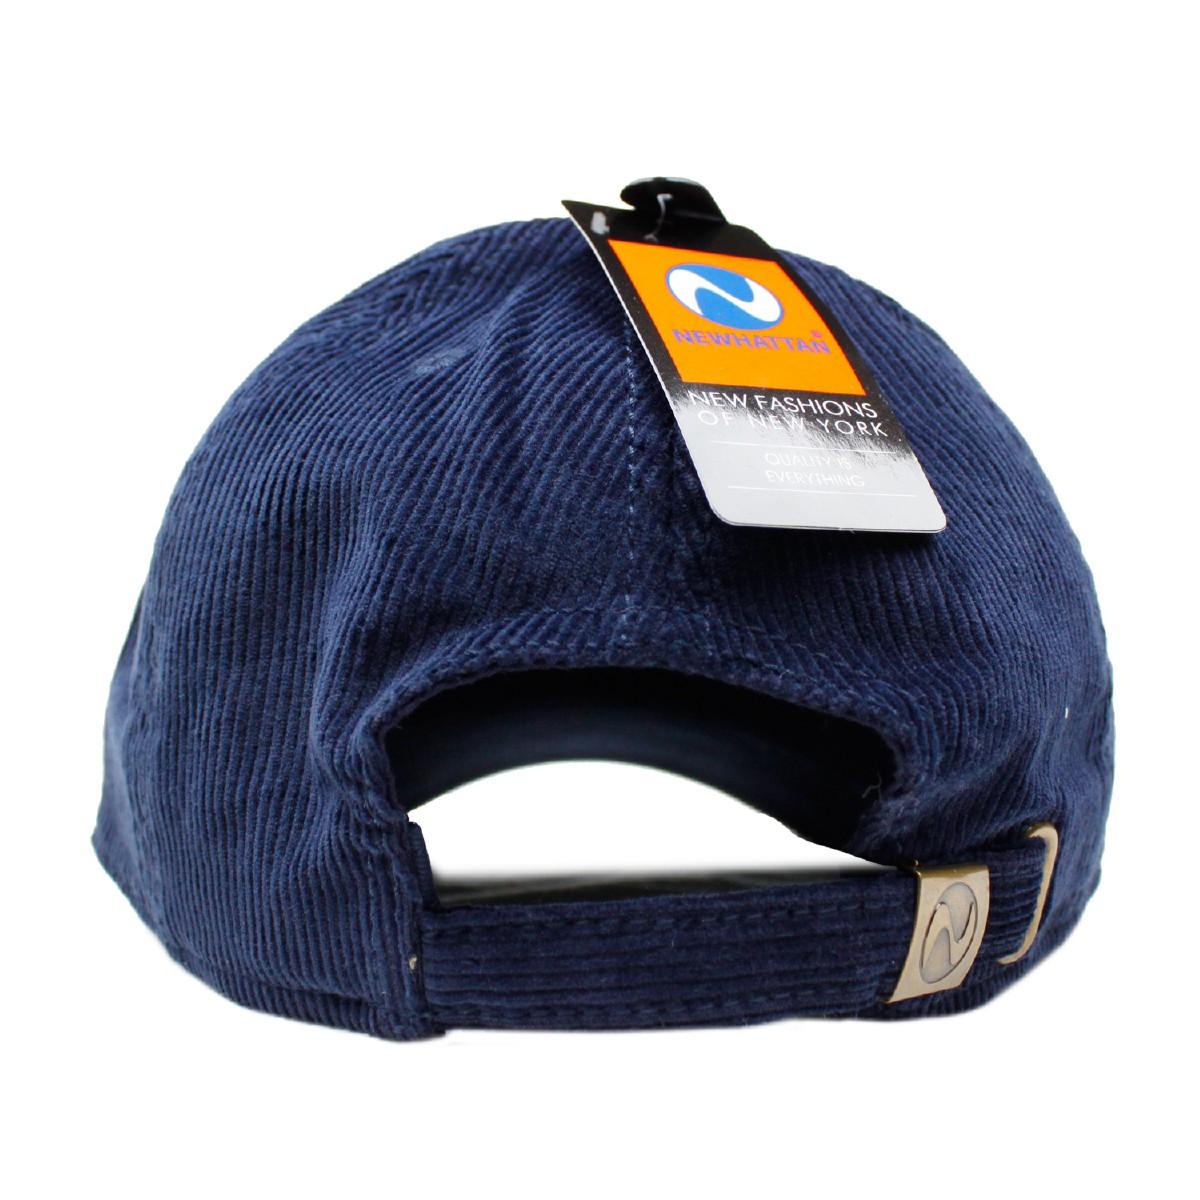 Blueism ブルーイズム THUNDER CORDUROYCAP